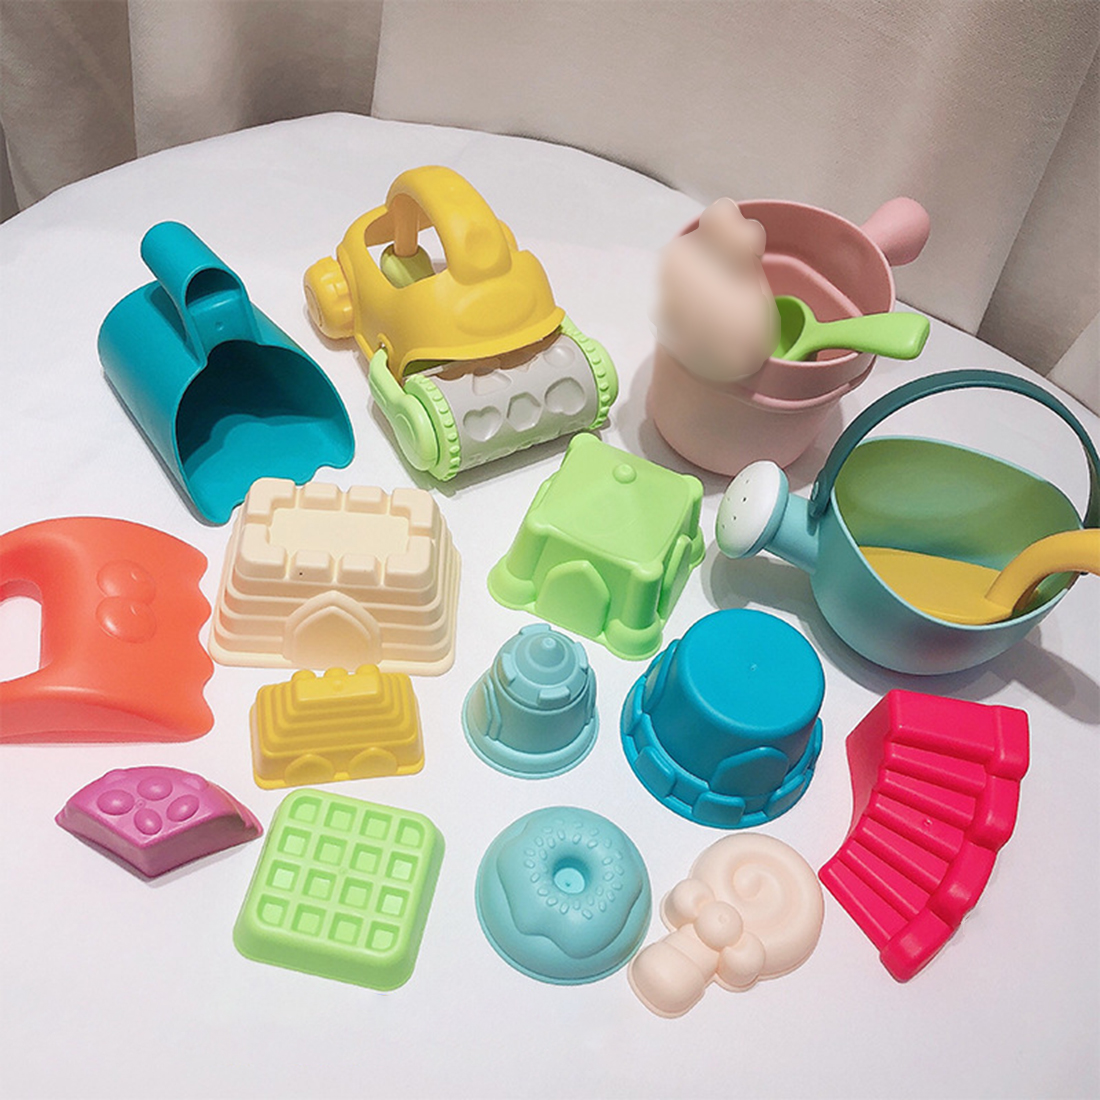 2020 Summer 17Pcs/set Children Outdoor Beach Playset PVC Castle Model Sand Beach Shovel Non-toxic Toy Gift For Kids Baby Fun